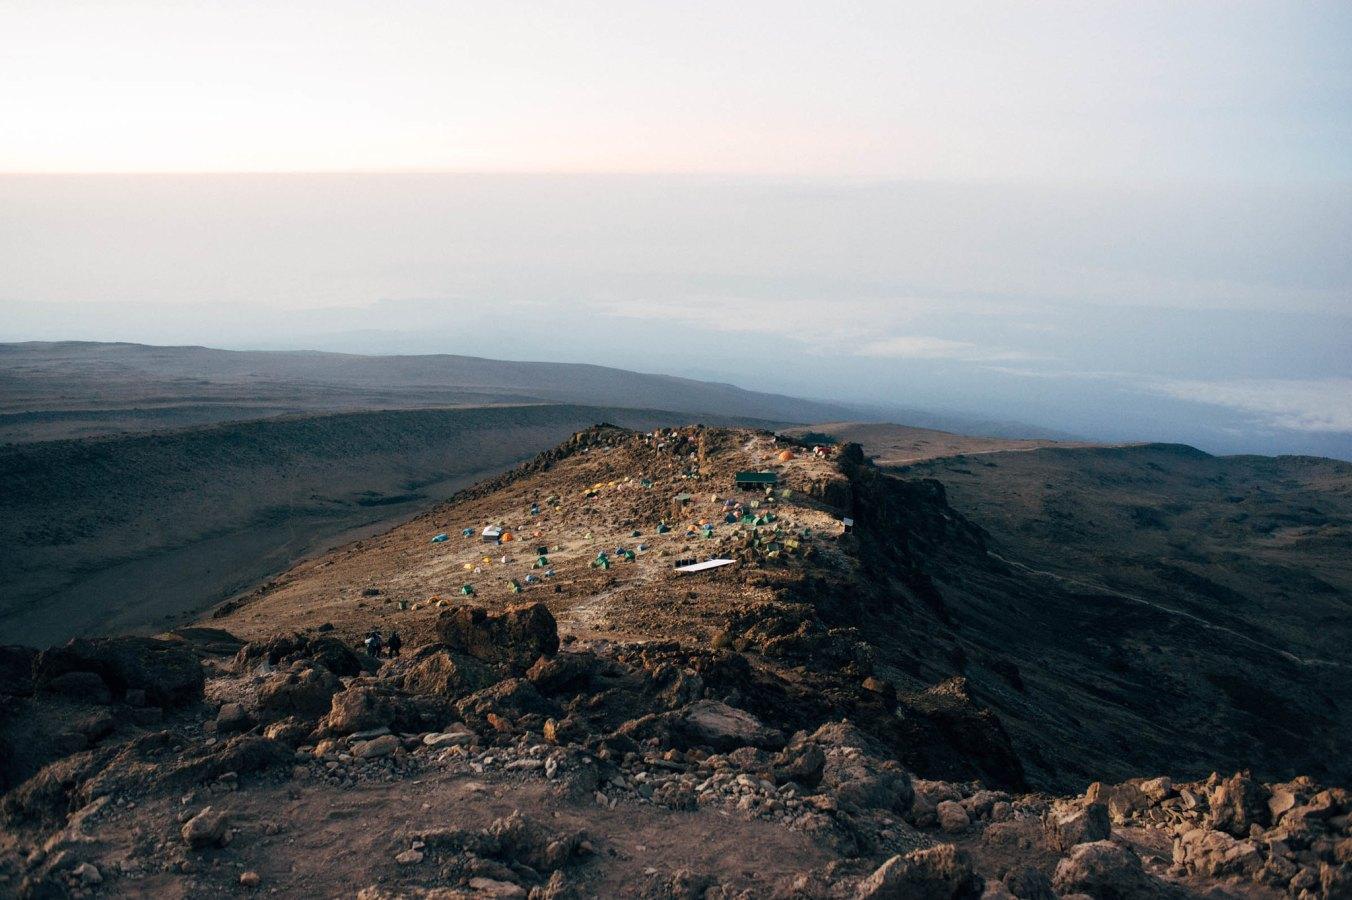 Kilimanjaro_33